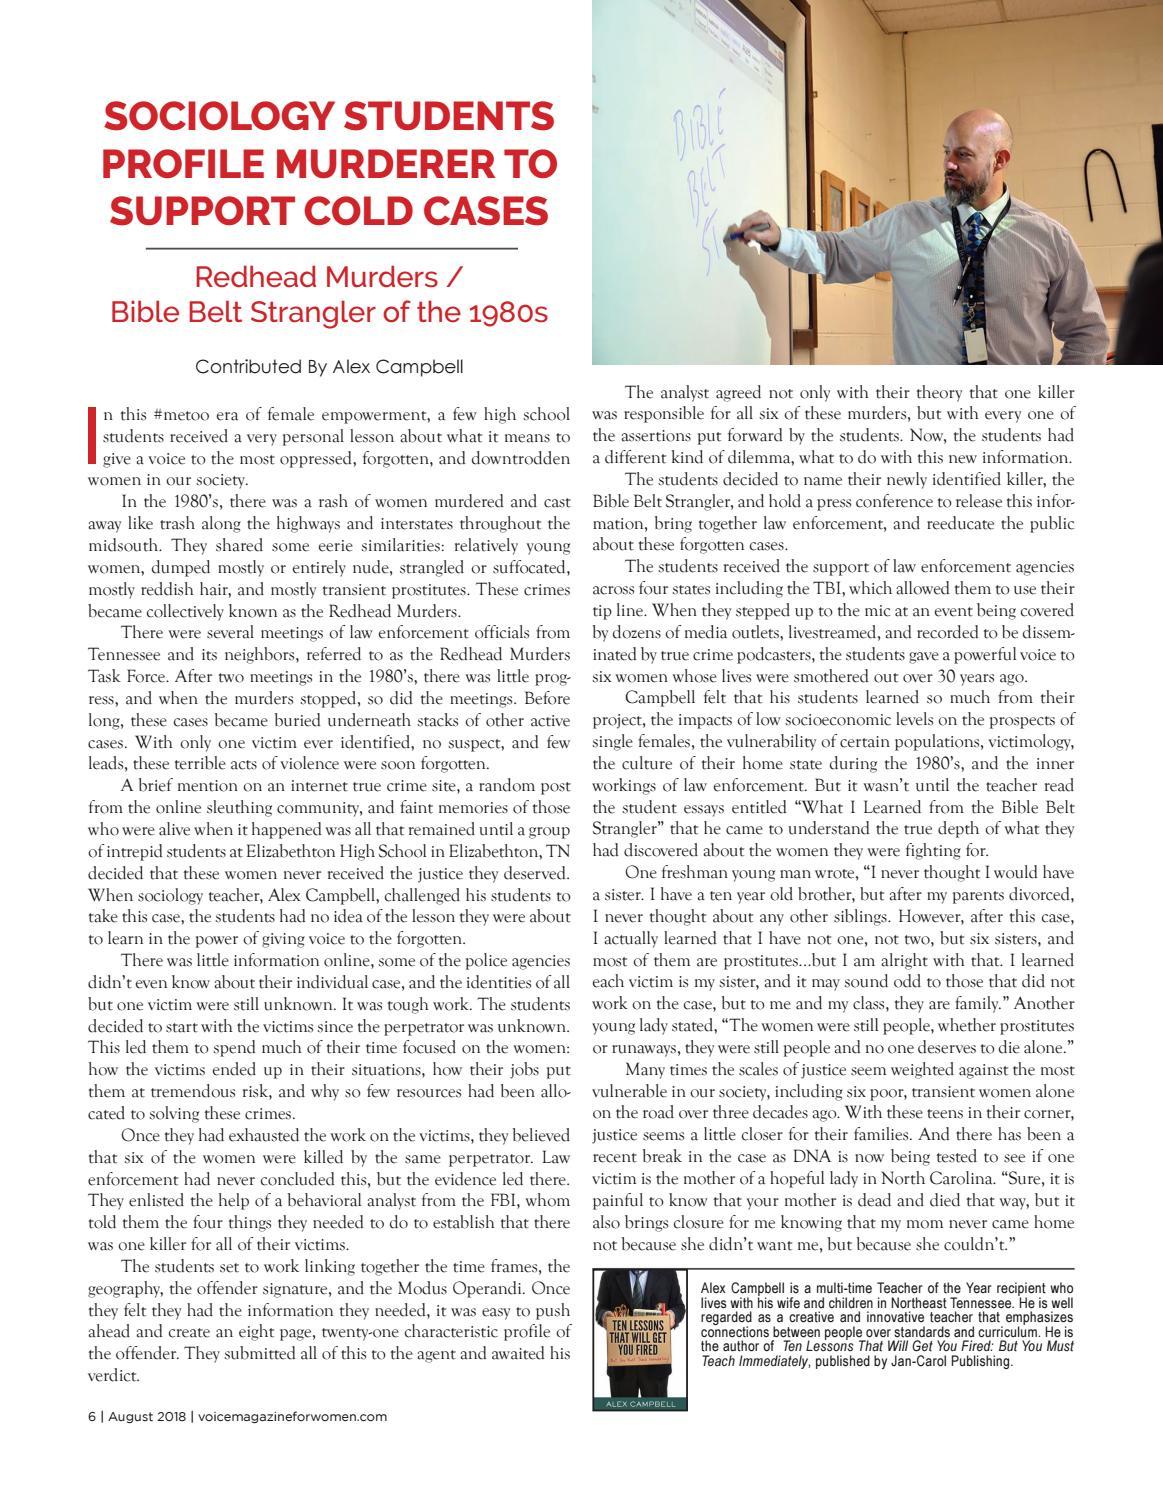 Voice magazine 0818 by Voice Magazine For Women - issuu